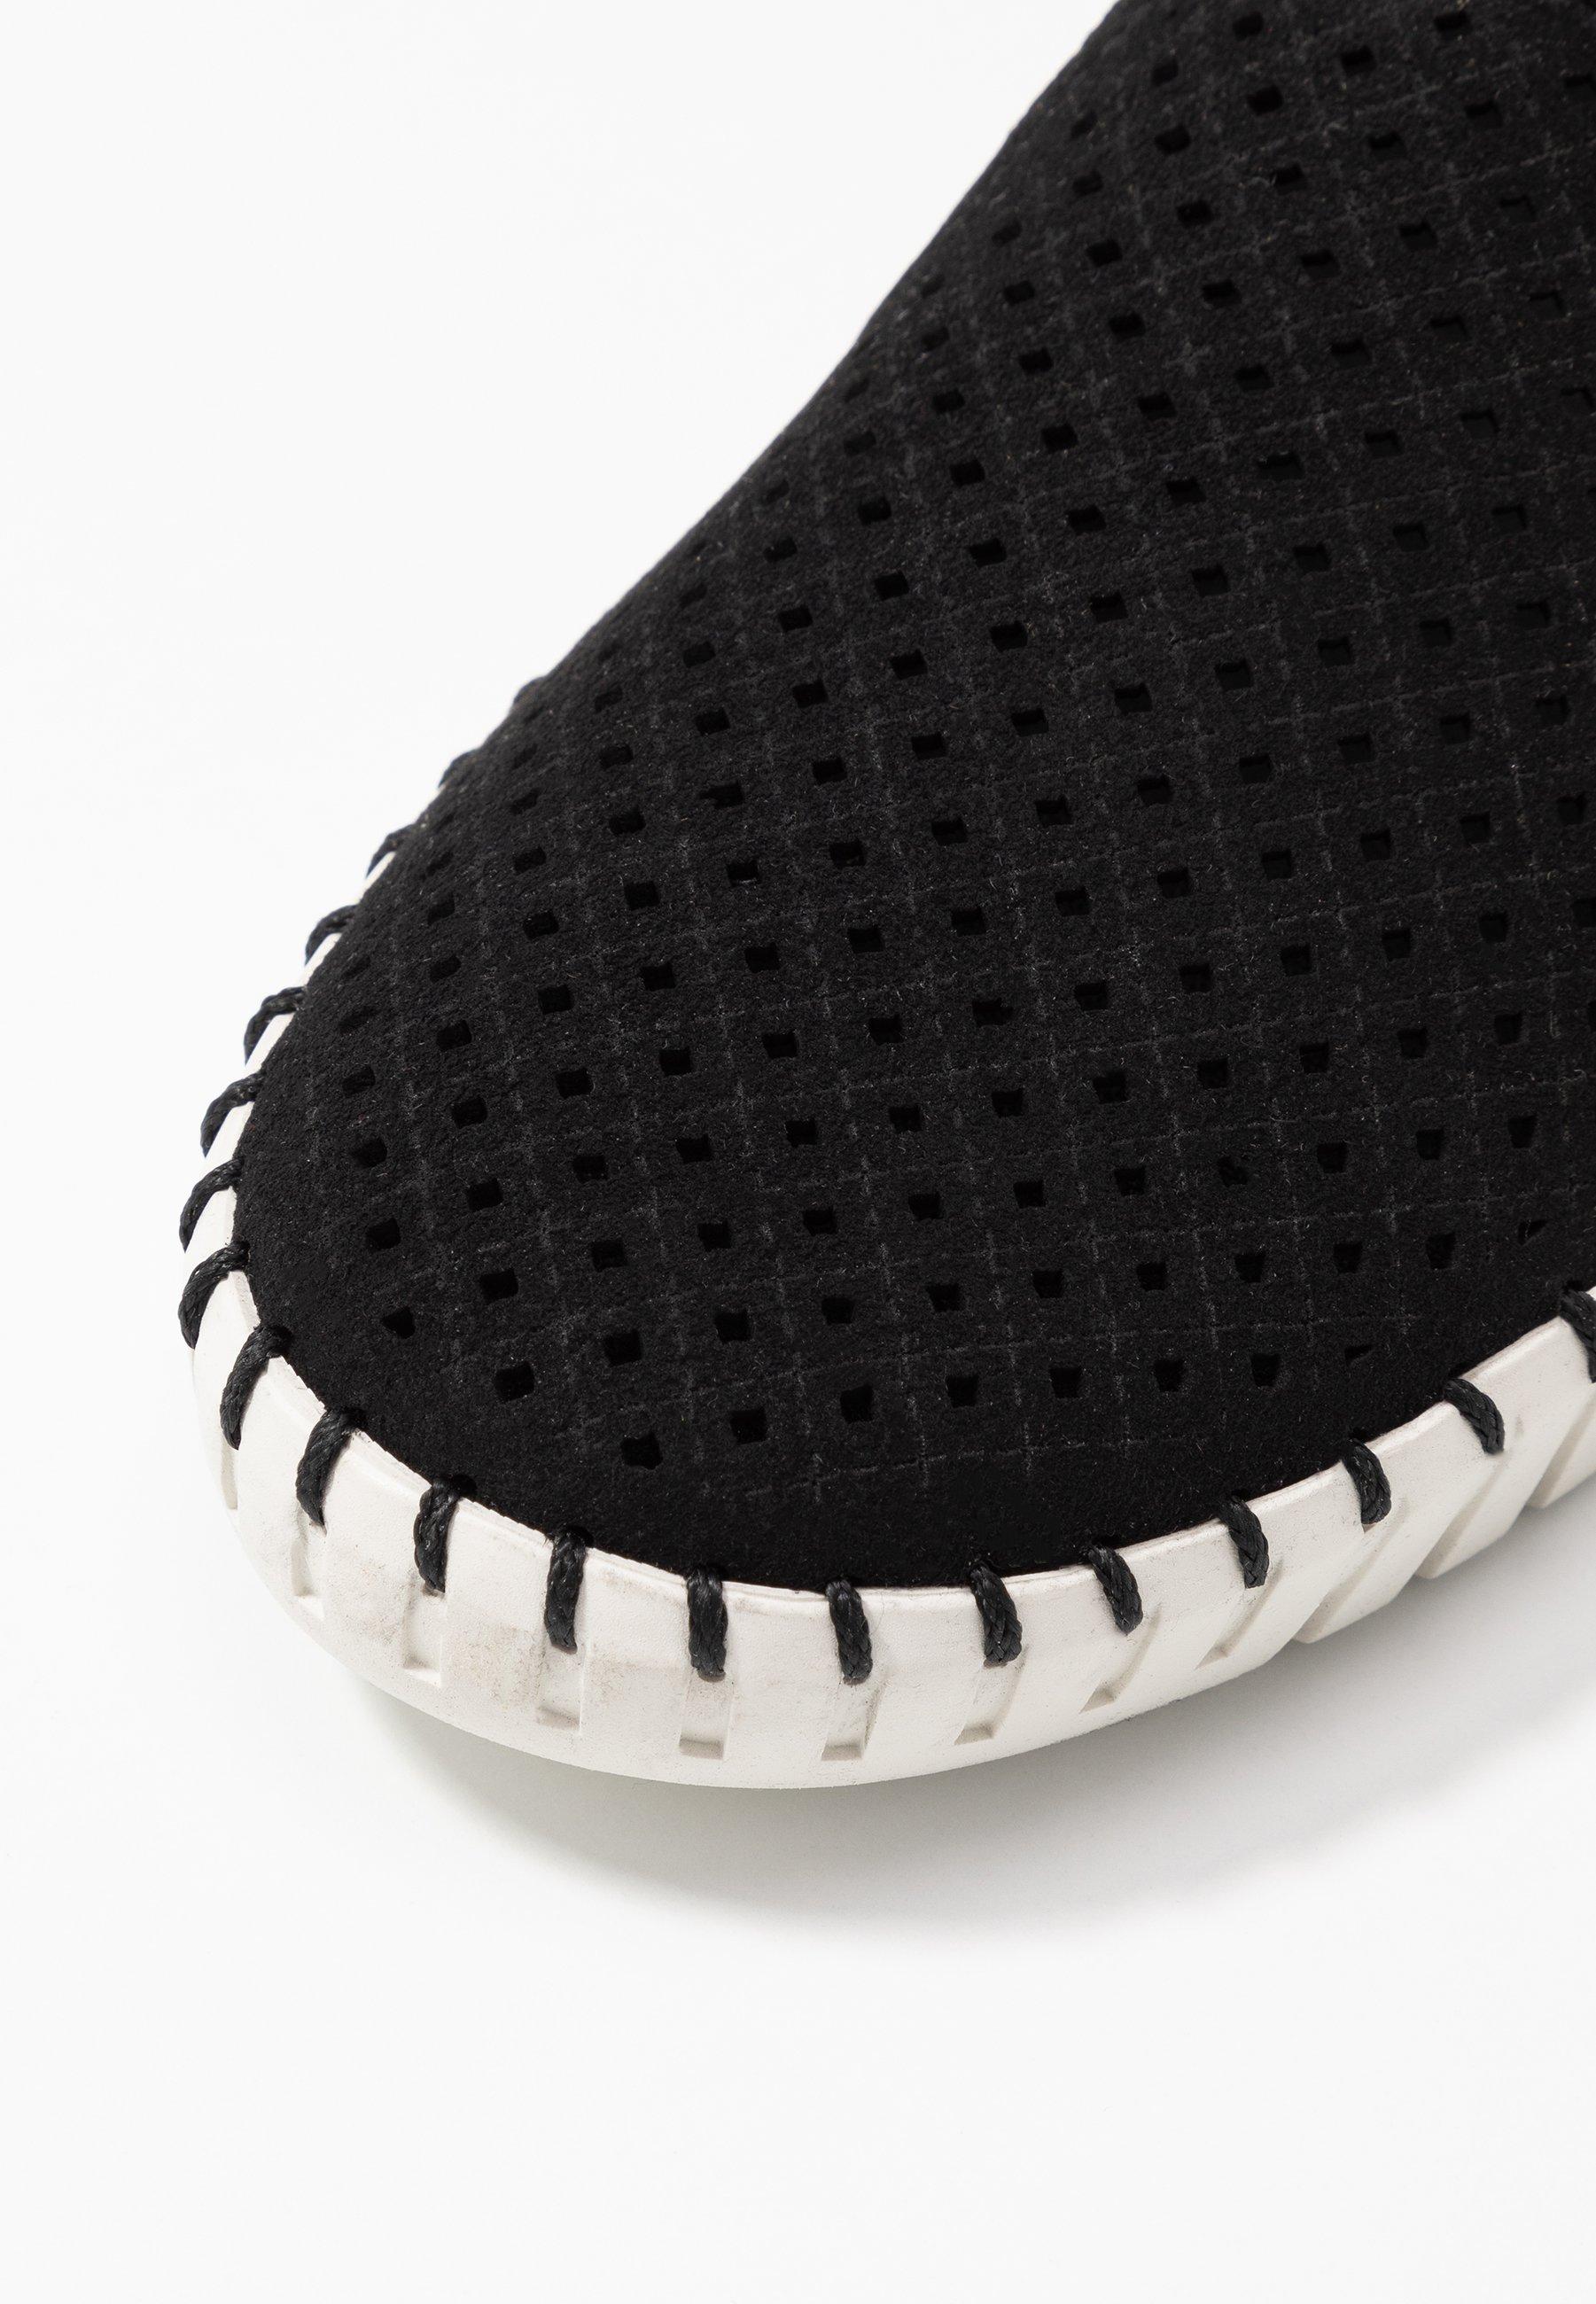 Skechers SEPULVEDA  - Półbuty wsuwane - black/offwhite